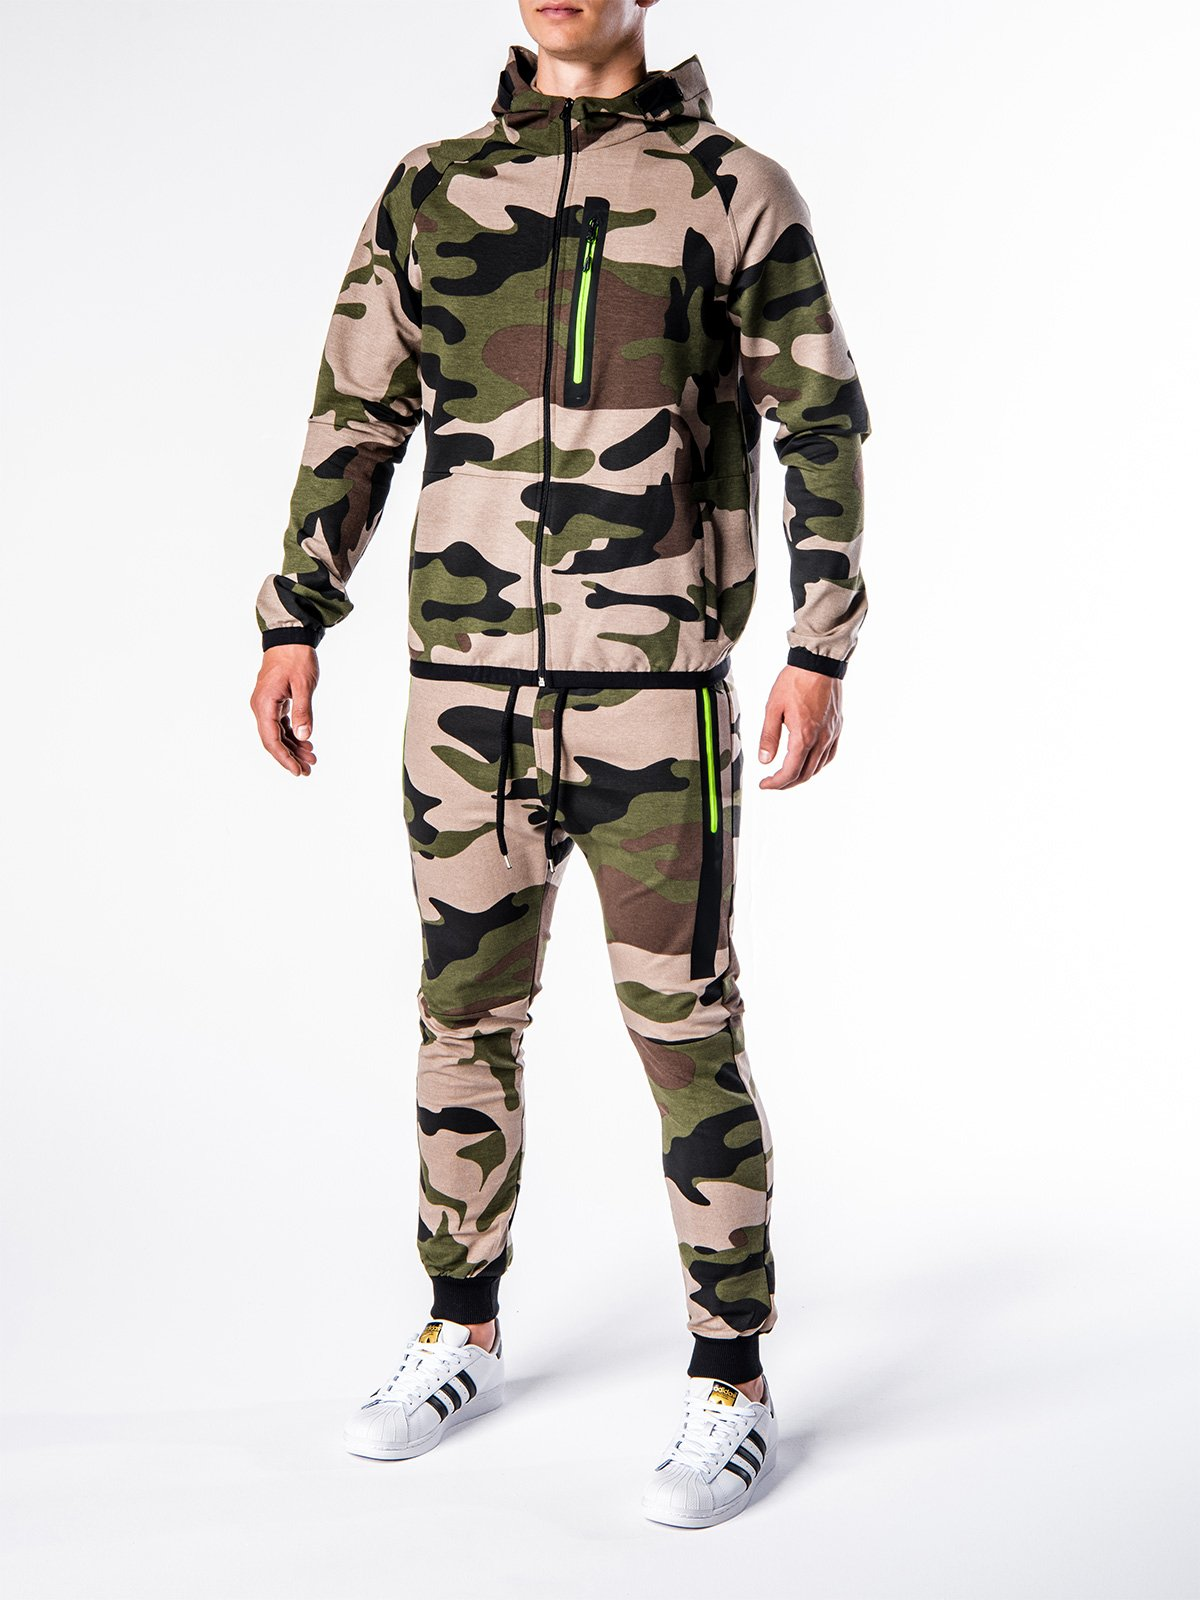 Komplet MĘski Bluza + Spodnie Z17 - Zielony/moro